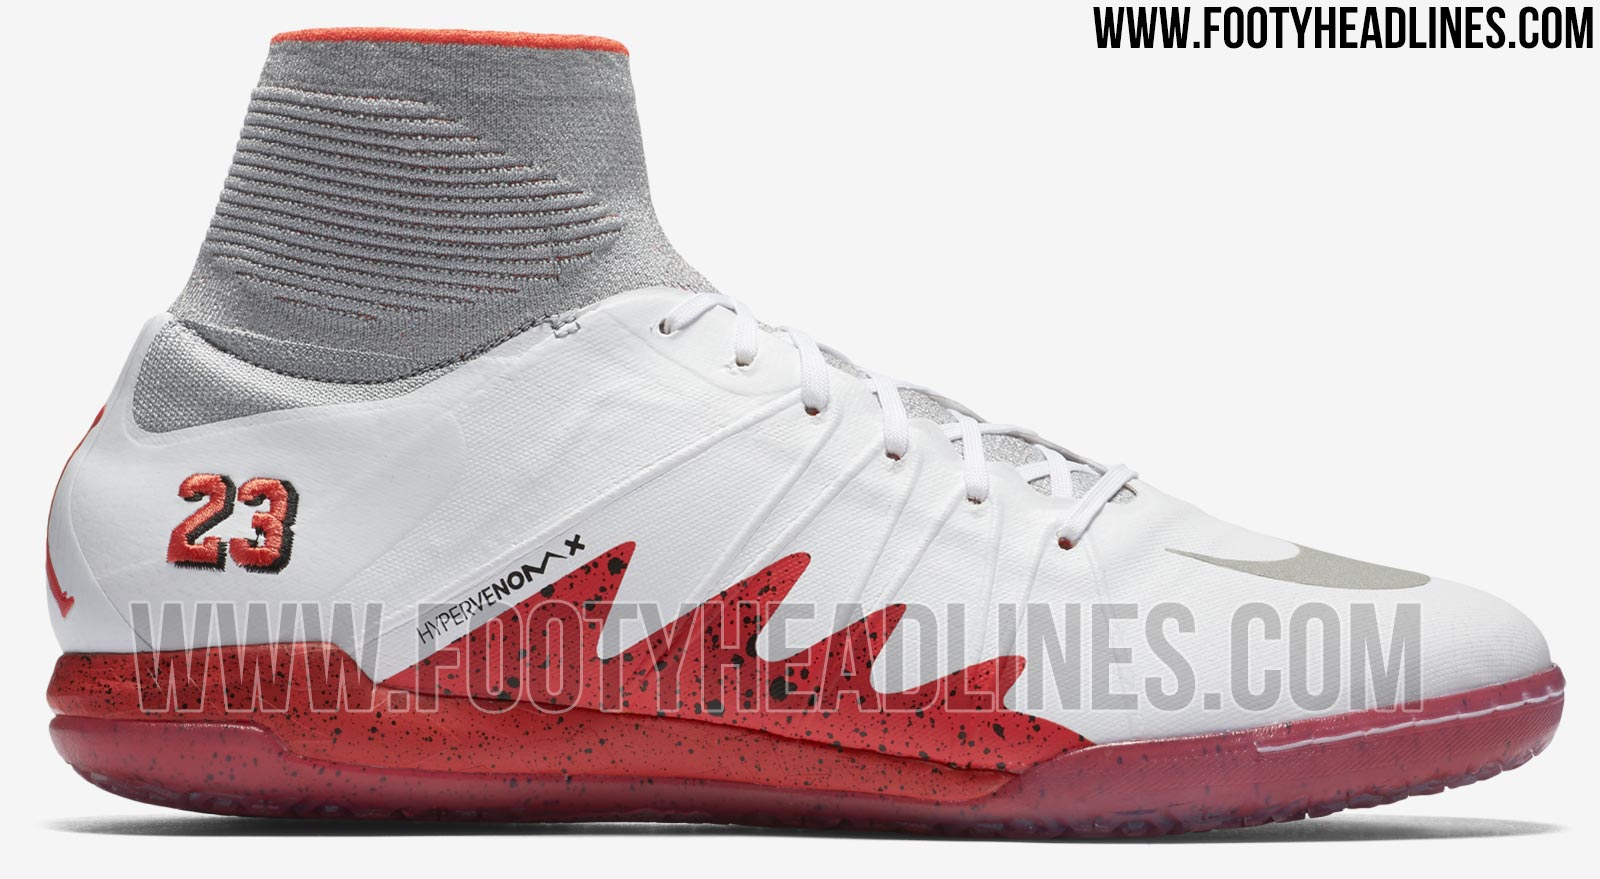 ... Nike HypervenomX Proximo Neymar x Jordan - White   Light Crimson    Black   Reflective Silver ... 3e992d086abef